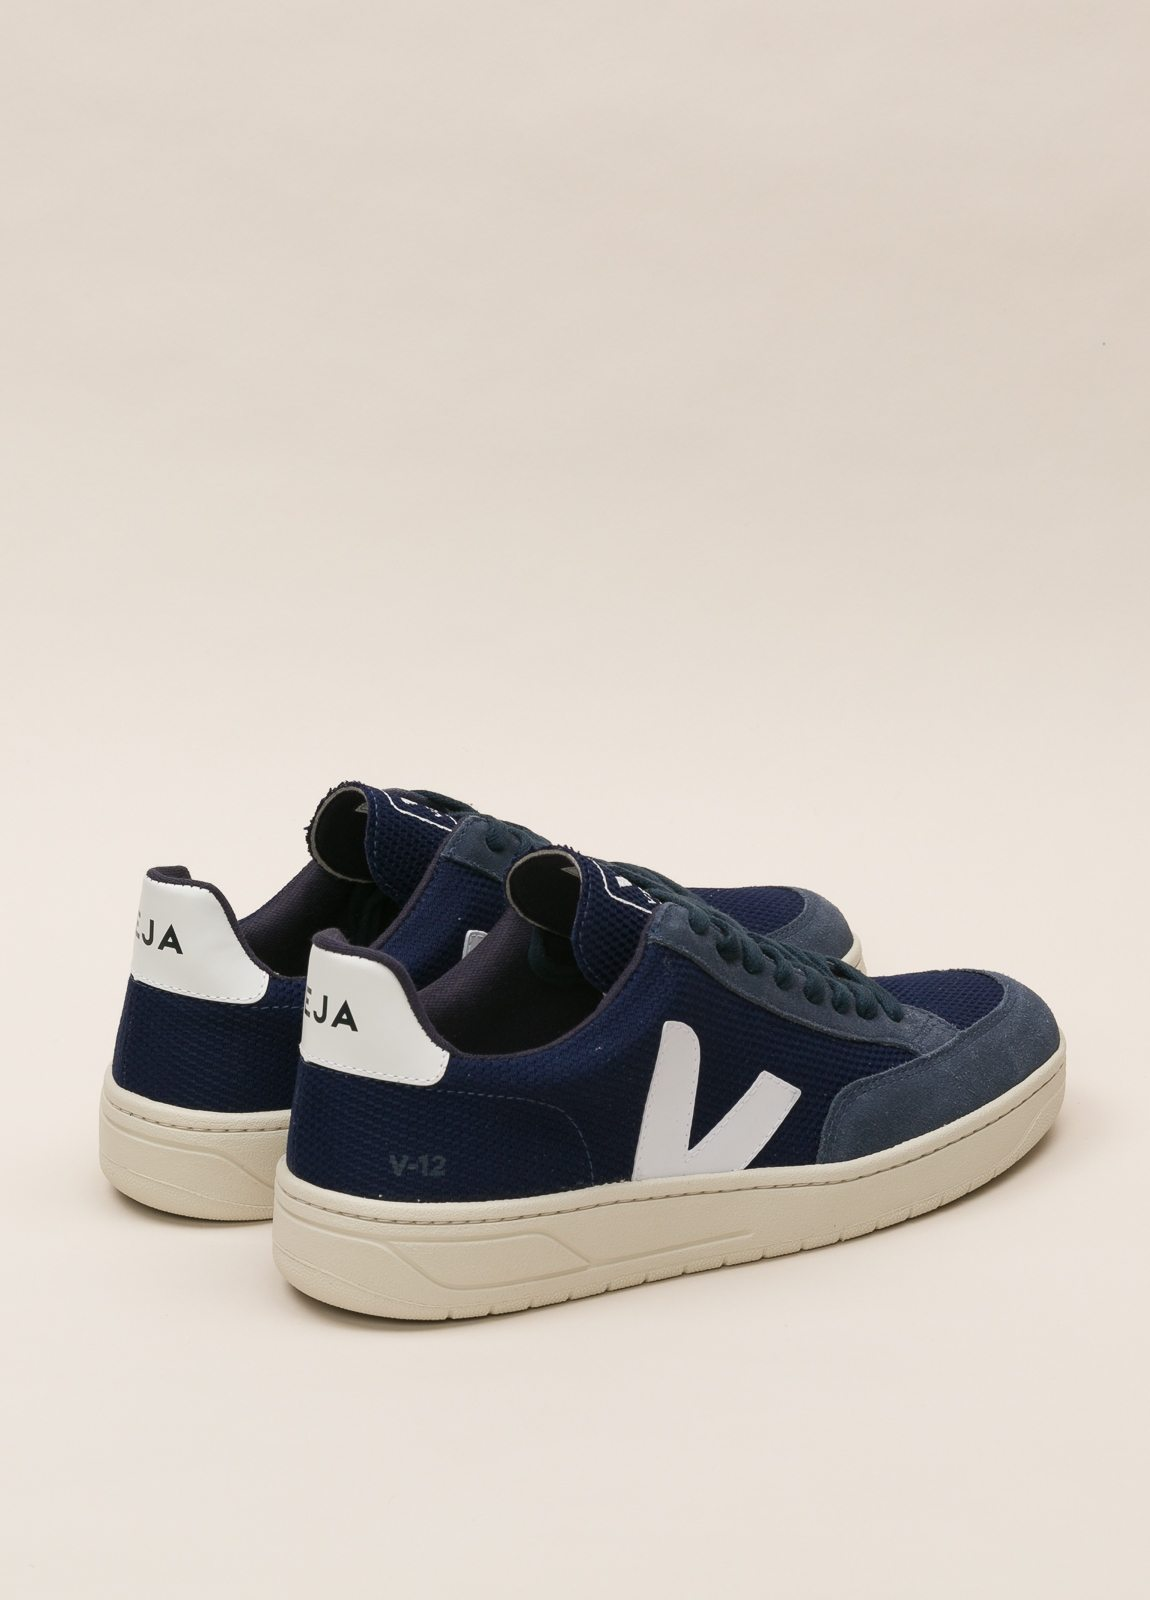 Zapatillas casual VEJA azul - Ítem4